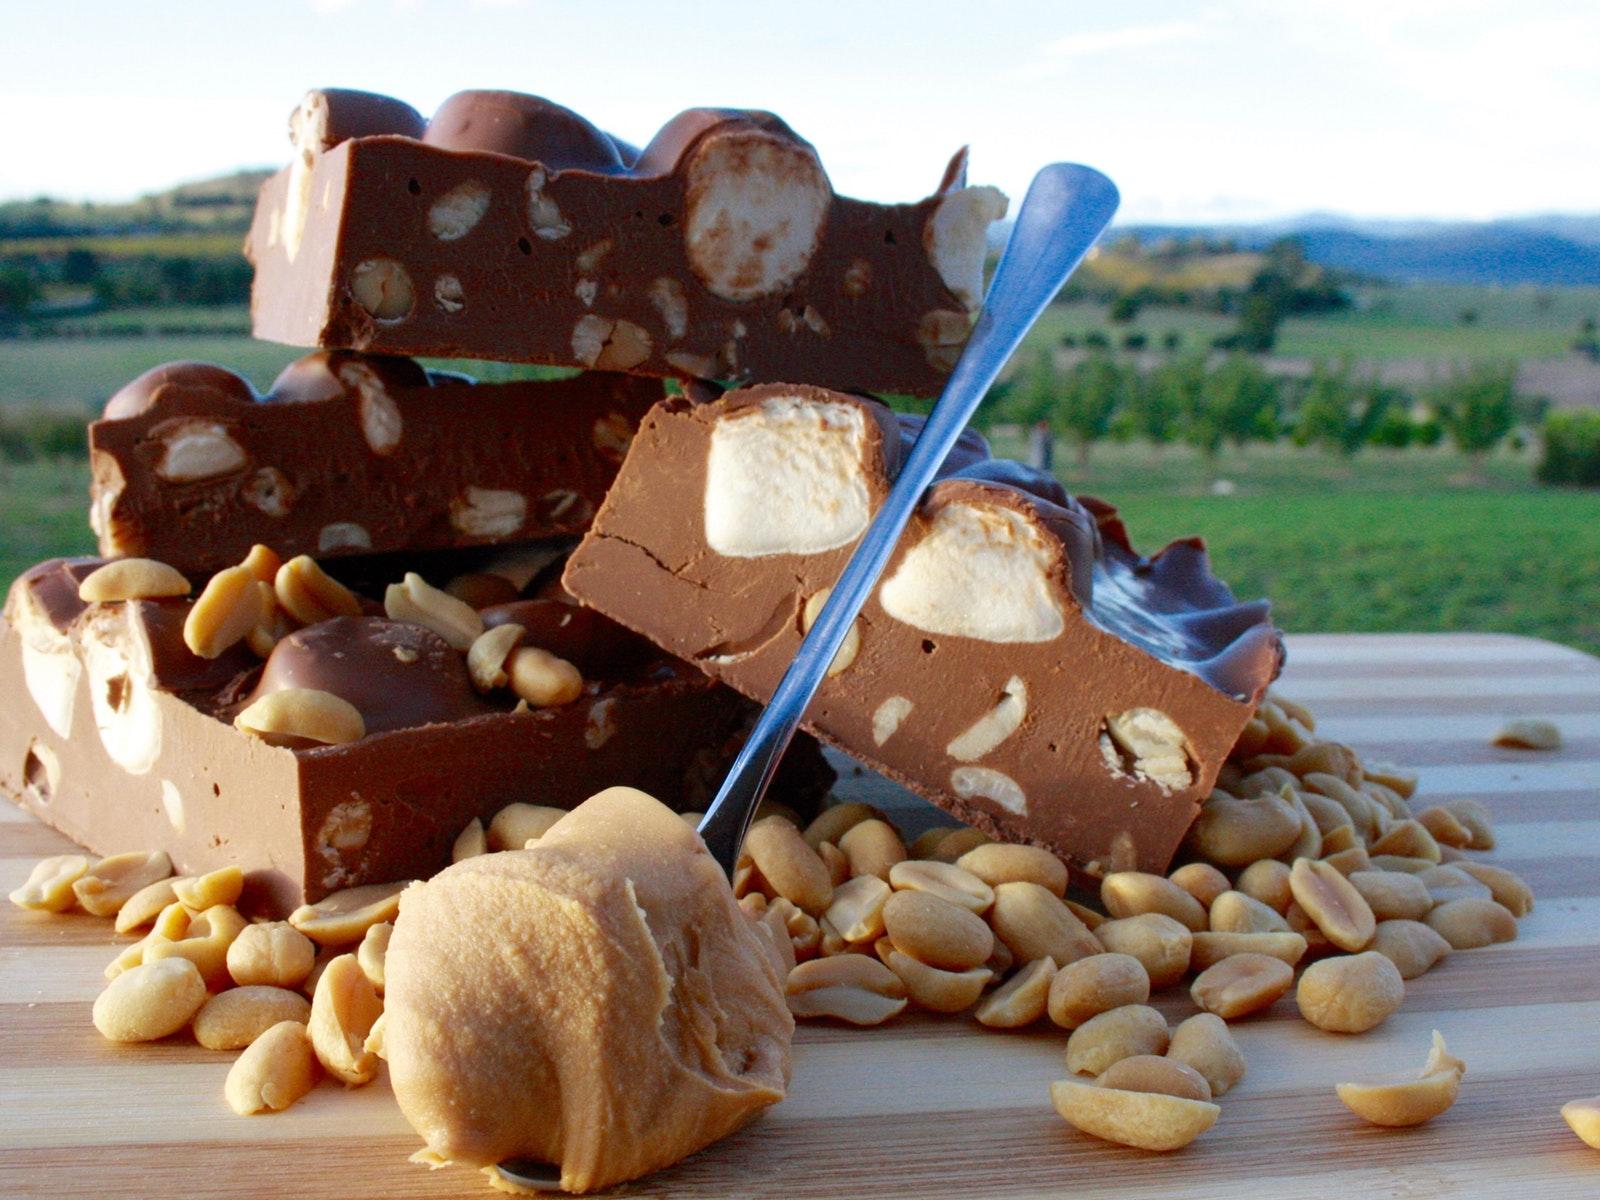 Rocky Road Festival - peanut butter crunch